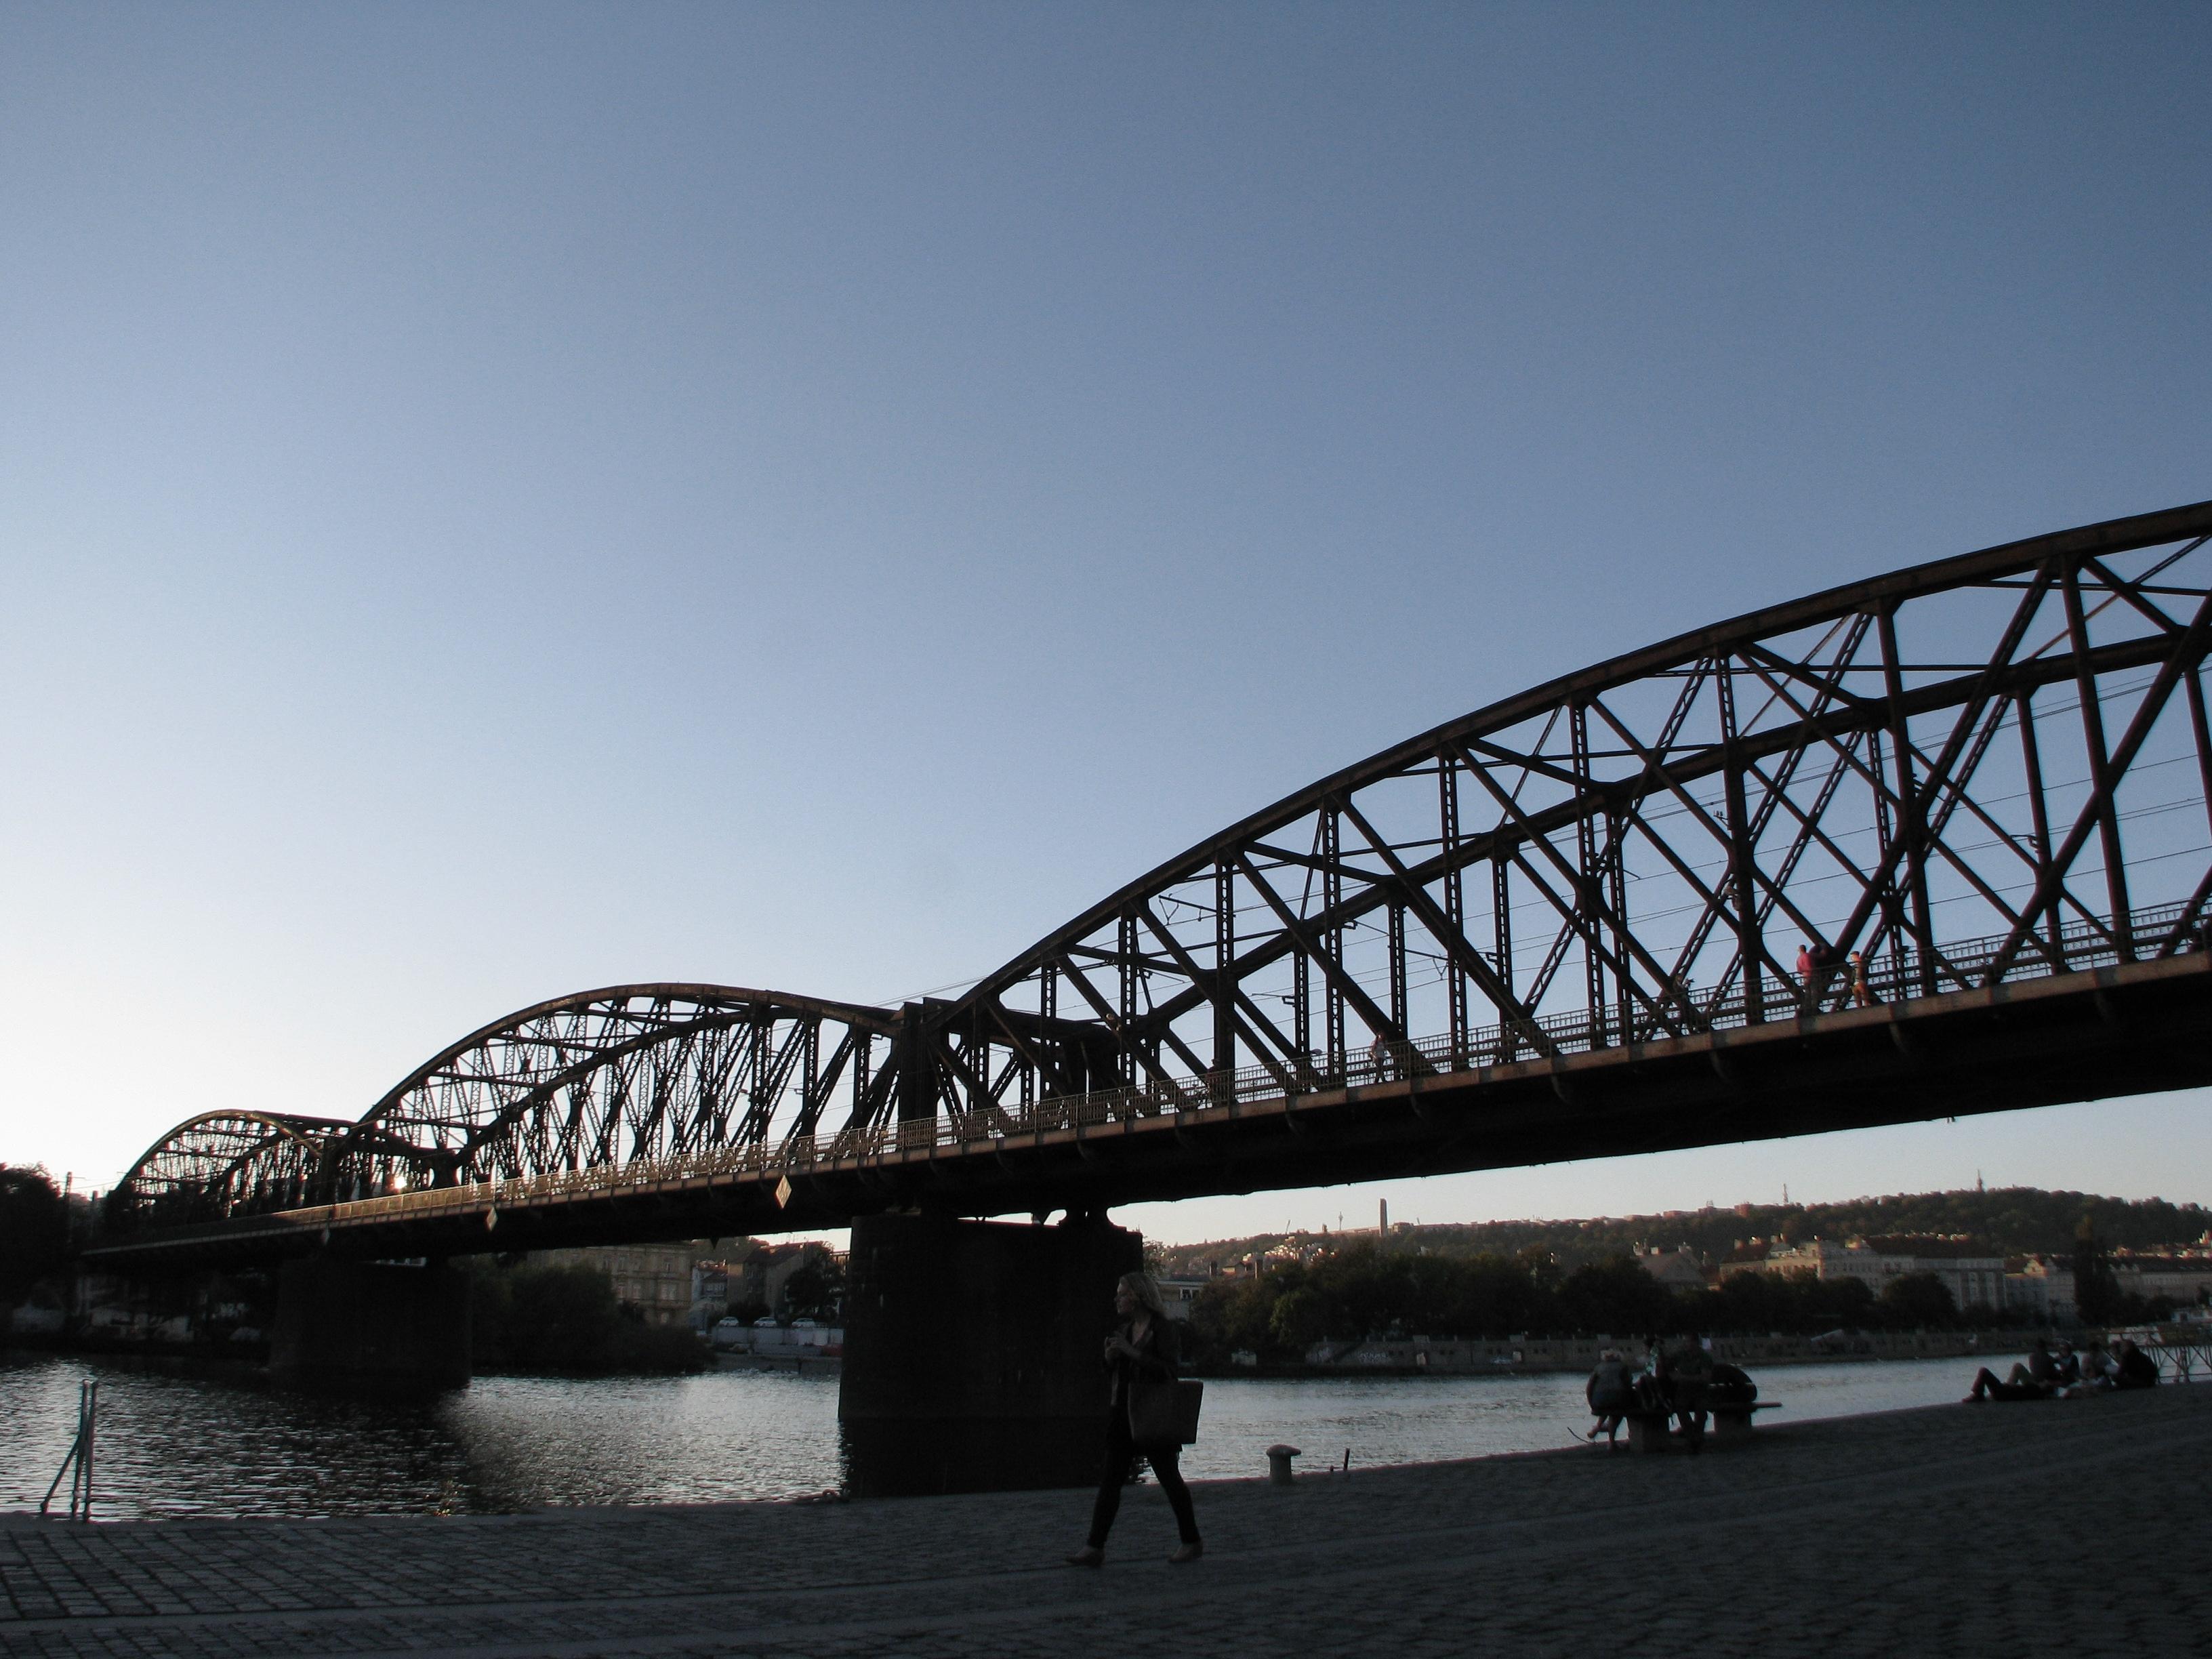 #Puentes